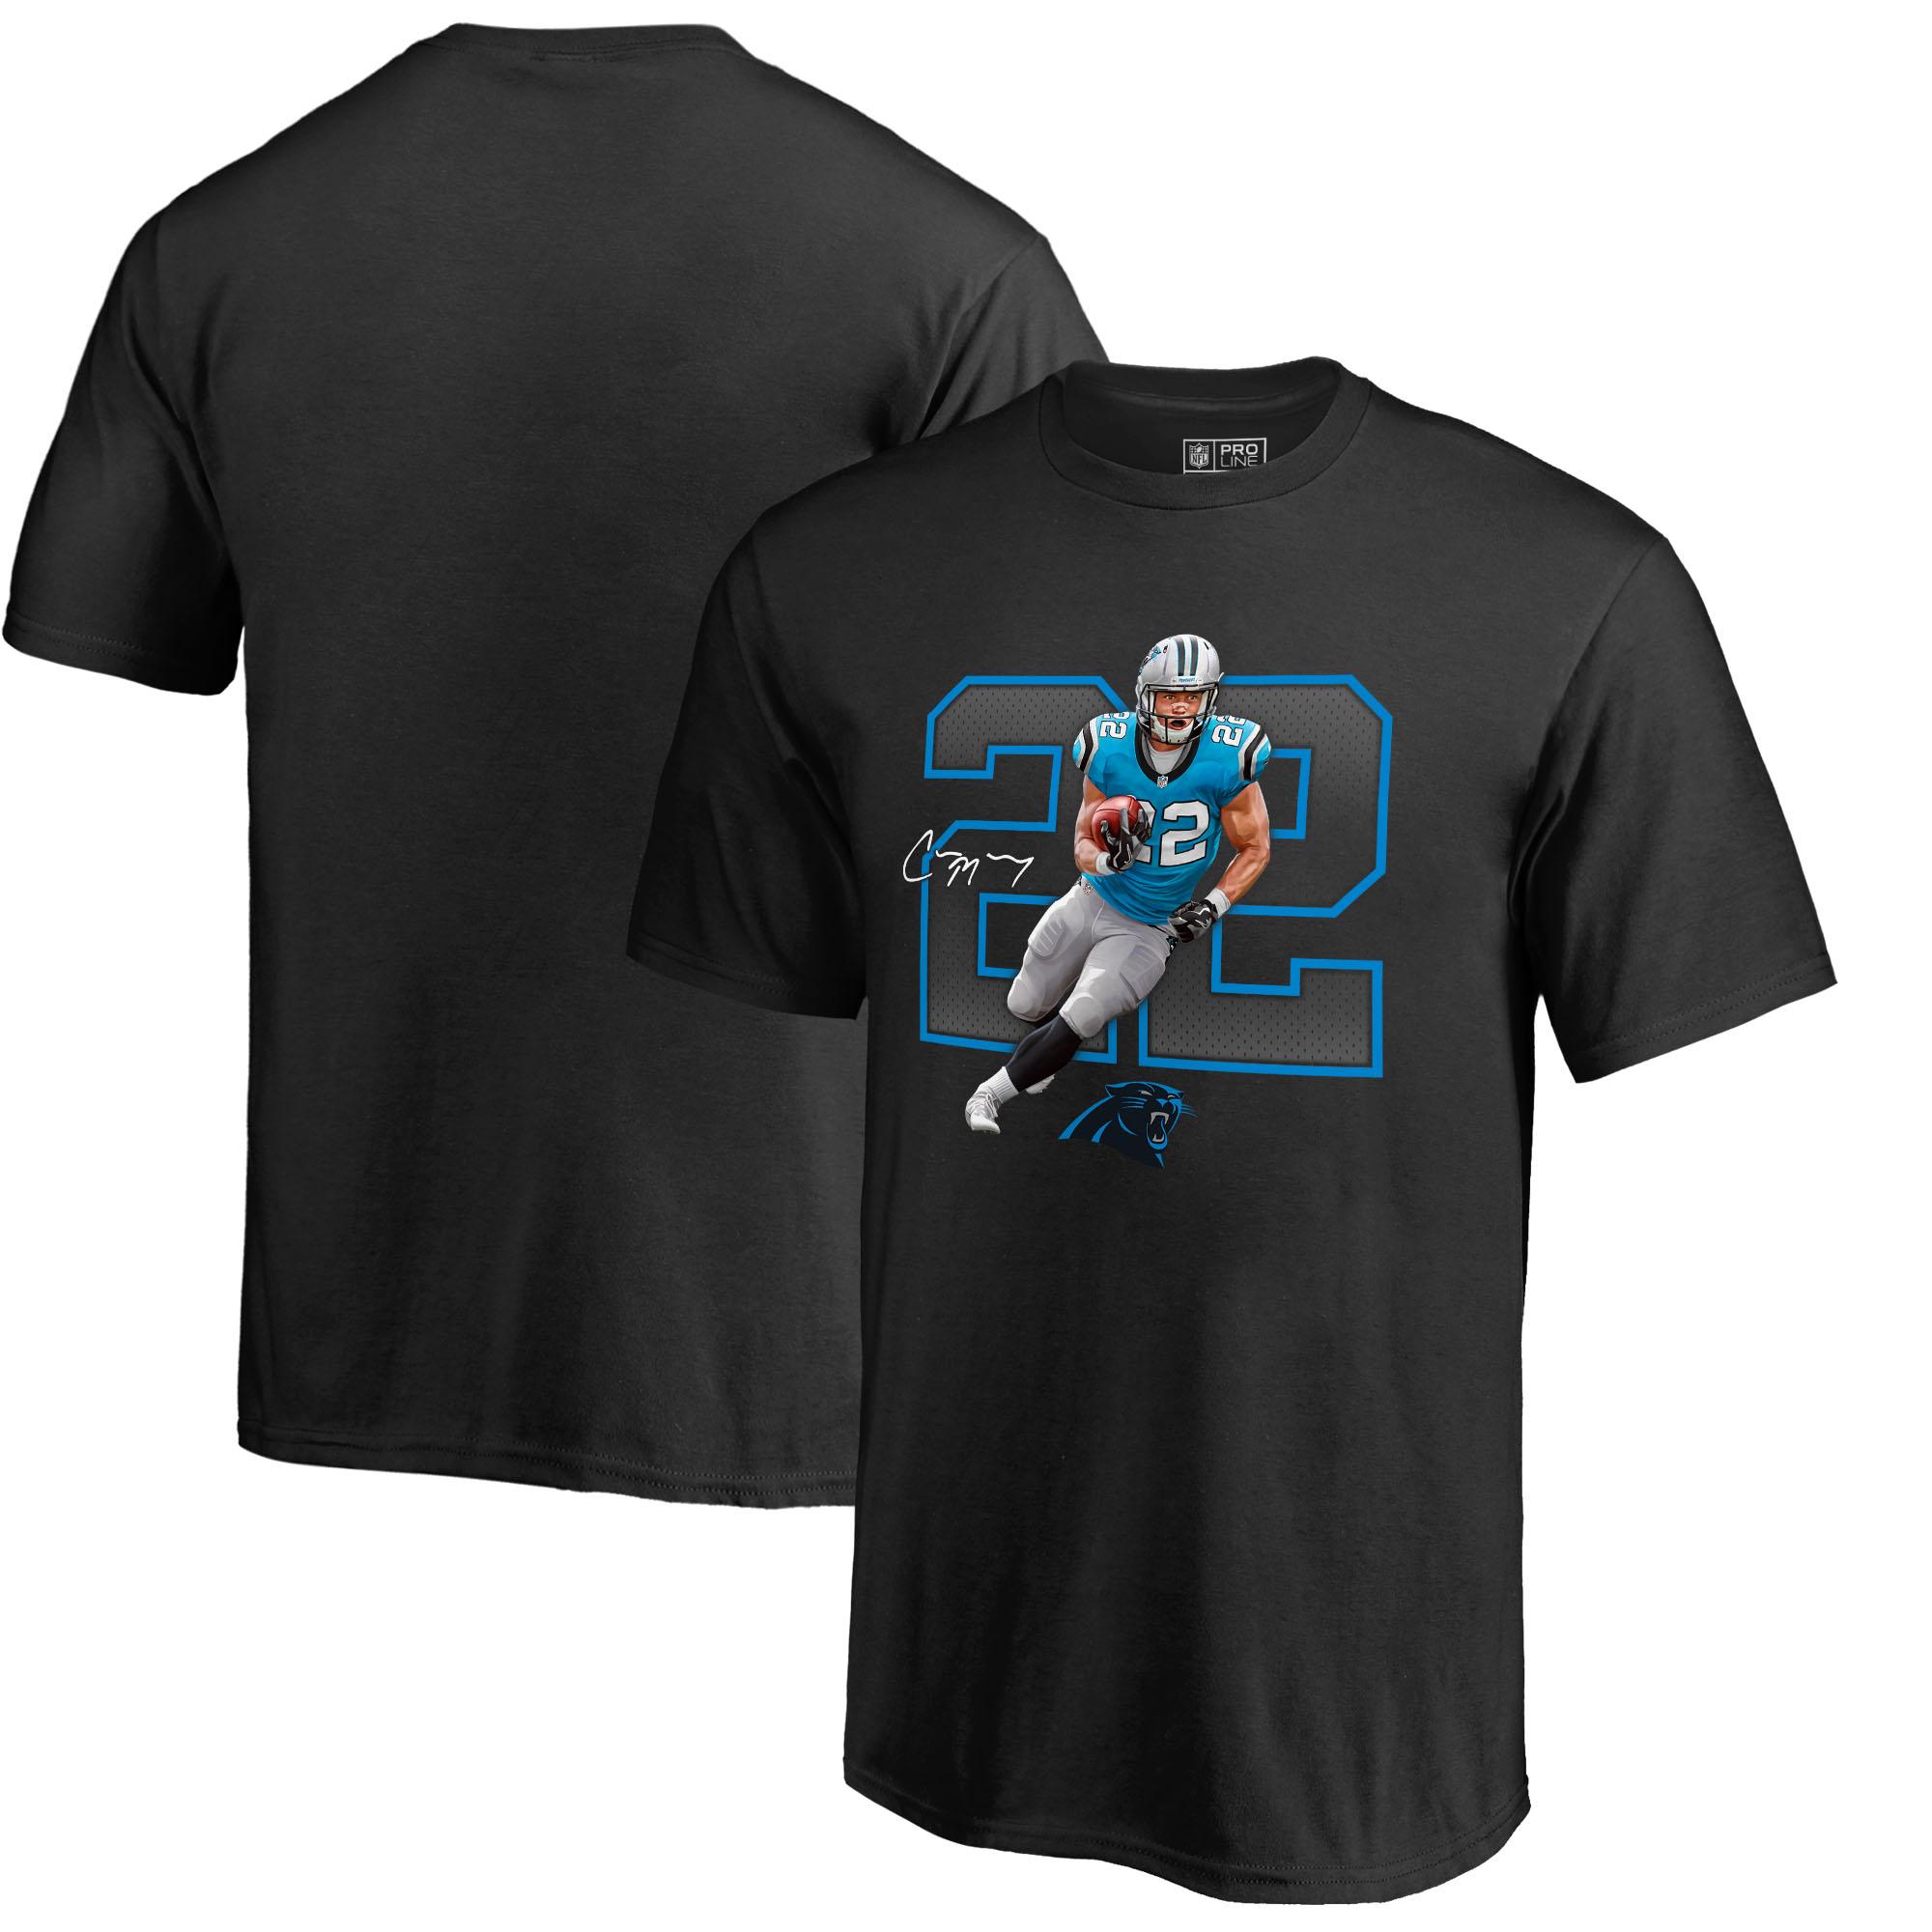 Christian McCaffrey Carolina Panthers NFL Pro Line by Fanatics Branded Youth Powerhouse T-Shirt - Black